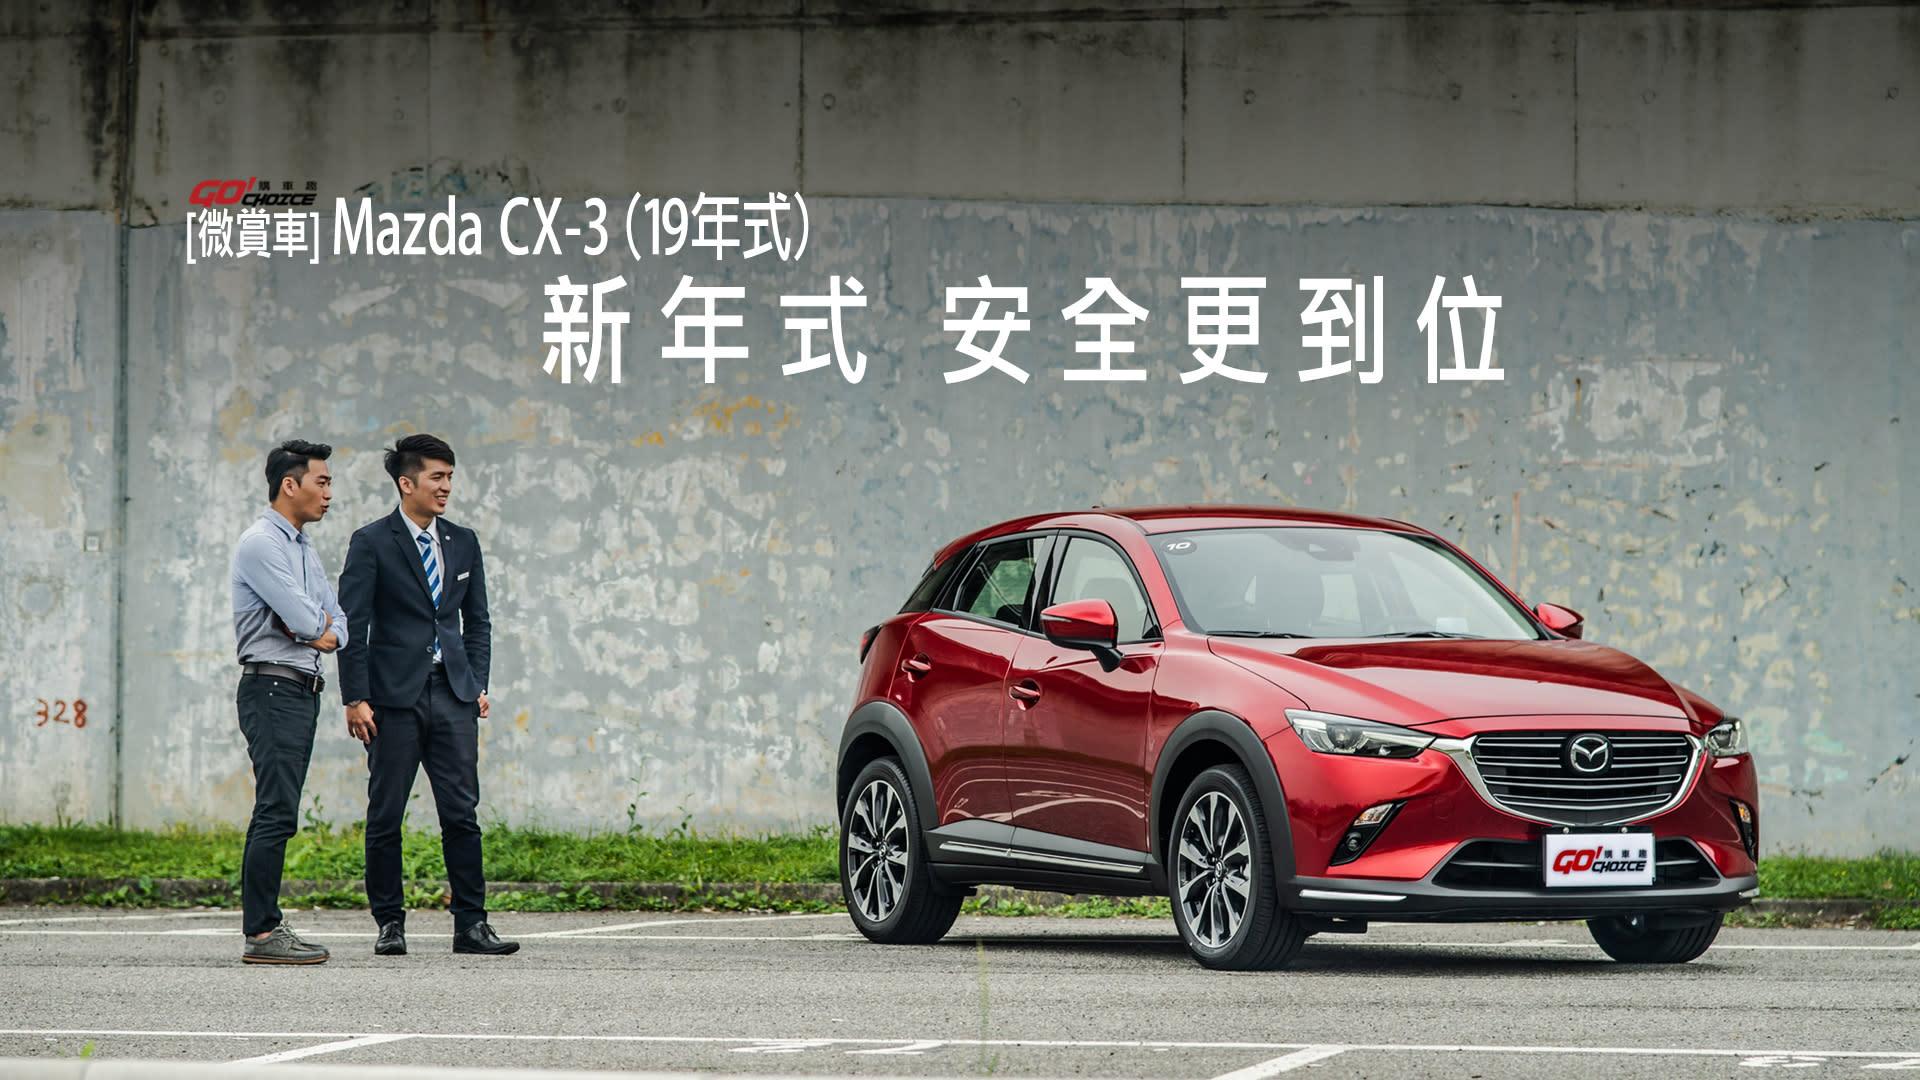 【GoChoice購車趣】19年式 Mazda CX-3 SKYACTIV-G旗艦版_新年式 安全更到位